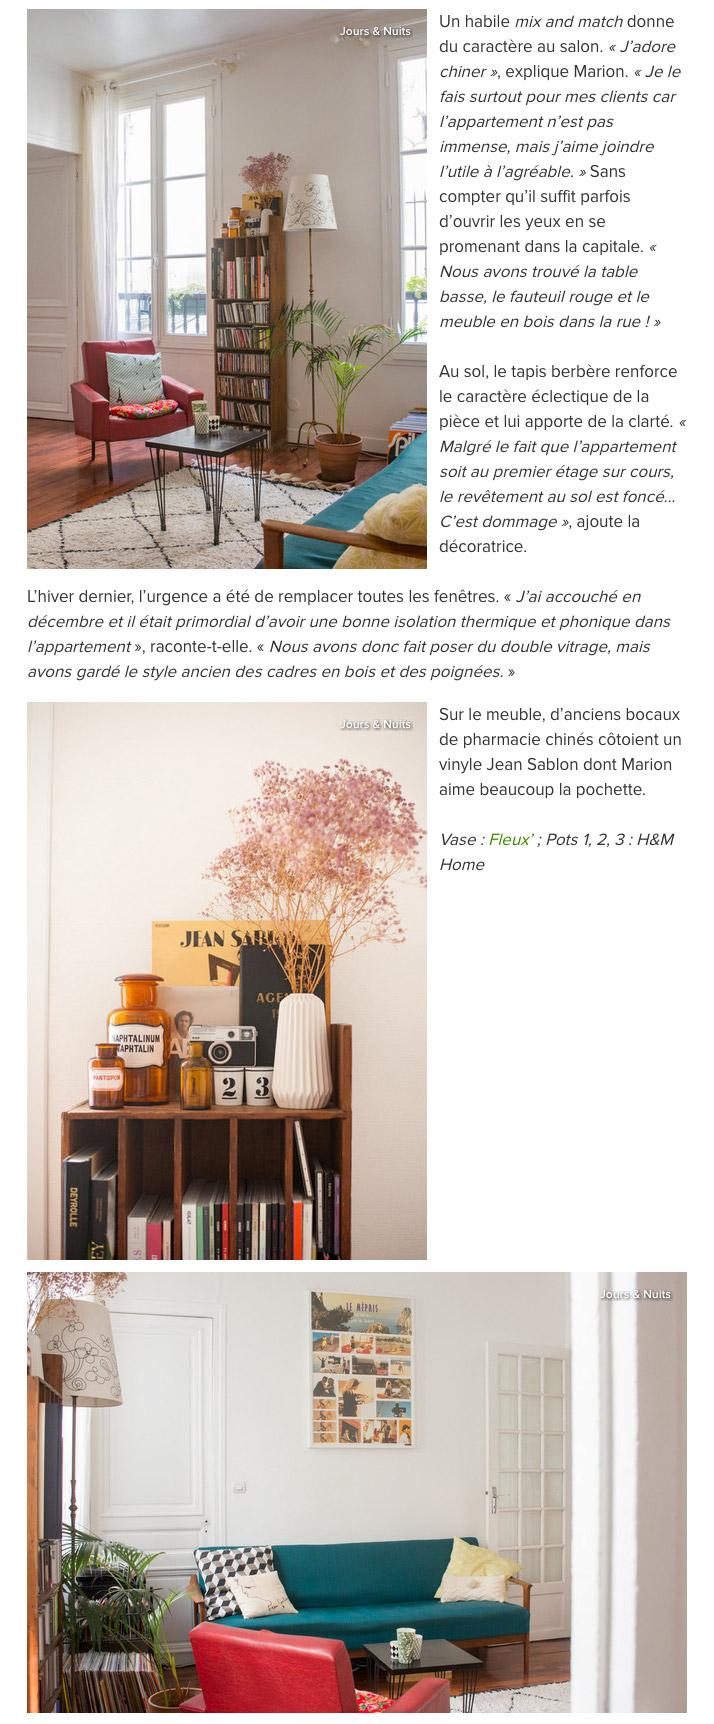 Home Design 3d Ipad 2 Home Design 3d Ipad 2 Etage Kitchen Design 100 Home